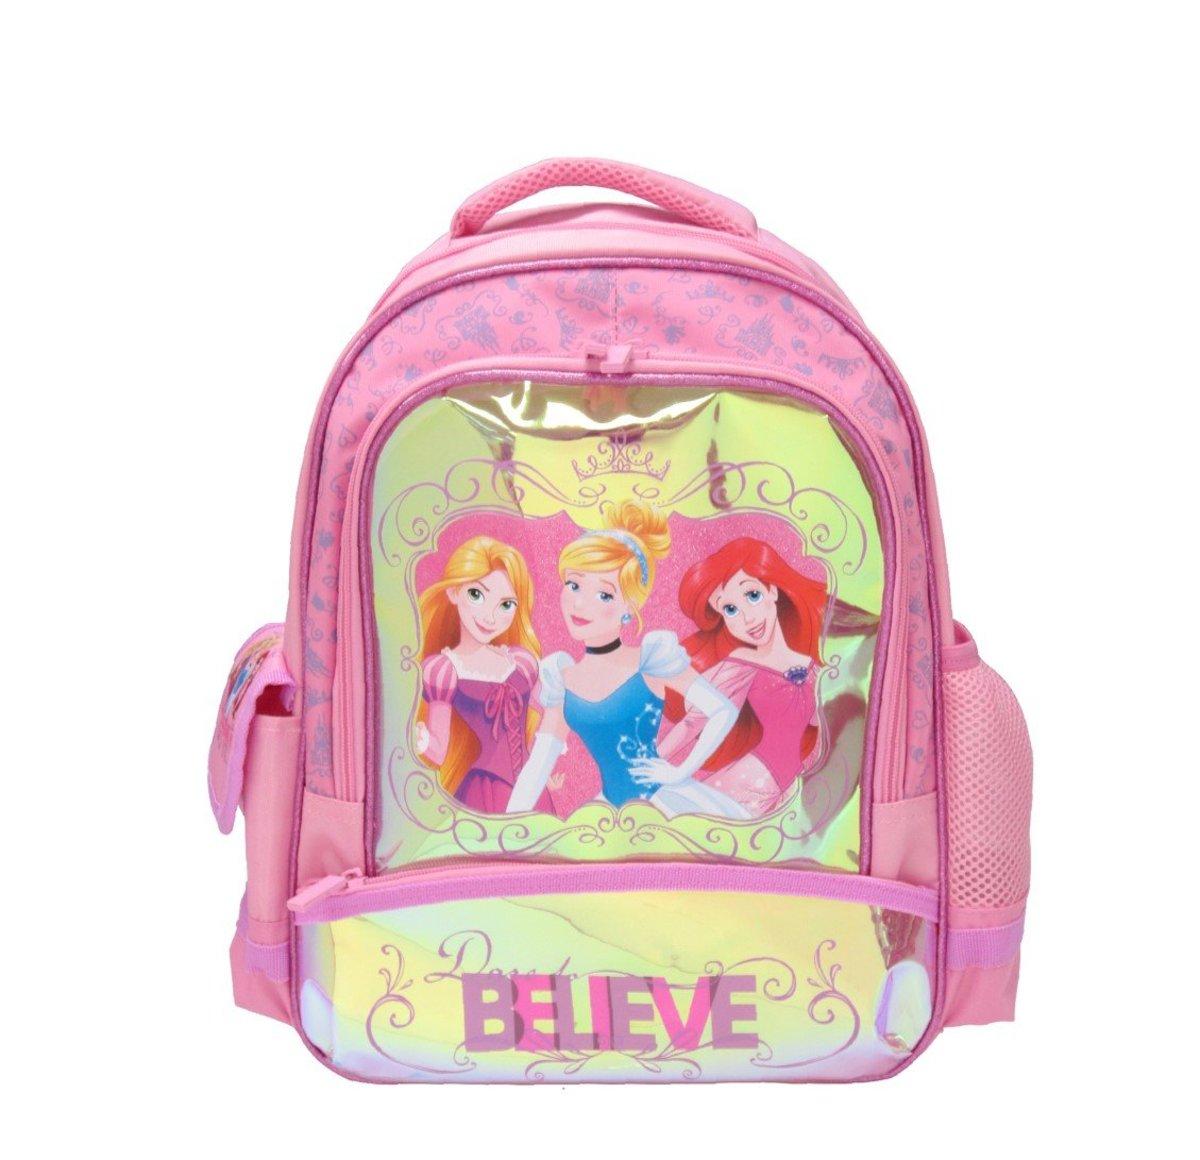 Disney迪士尼 --School Bag (Ironman) (Licensed by Disney)